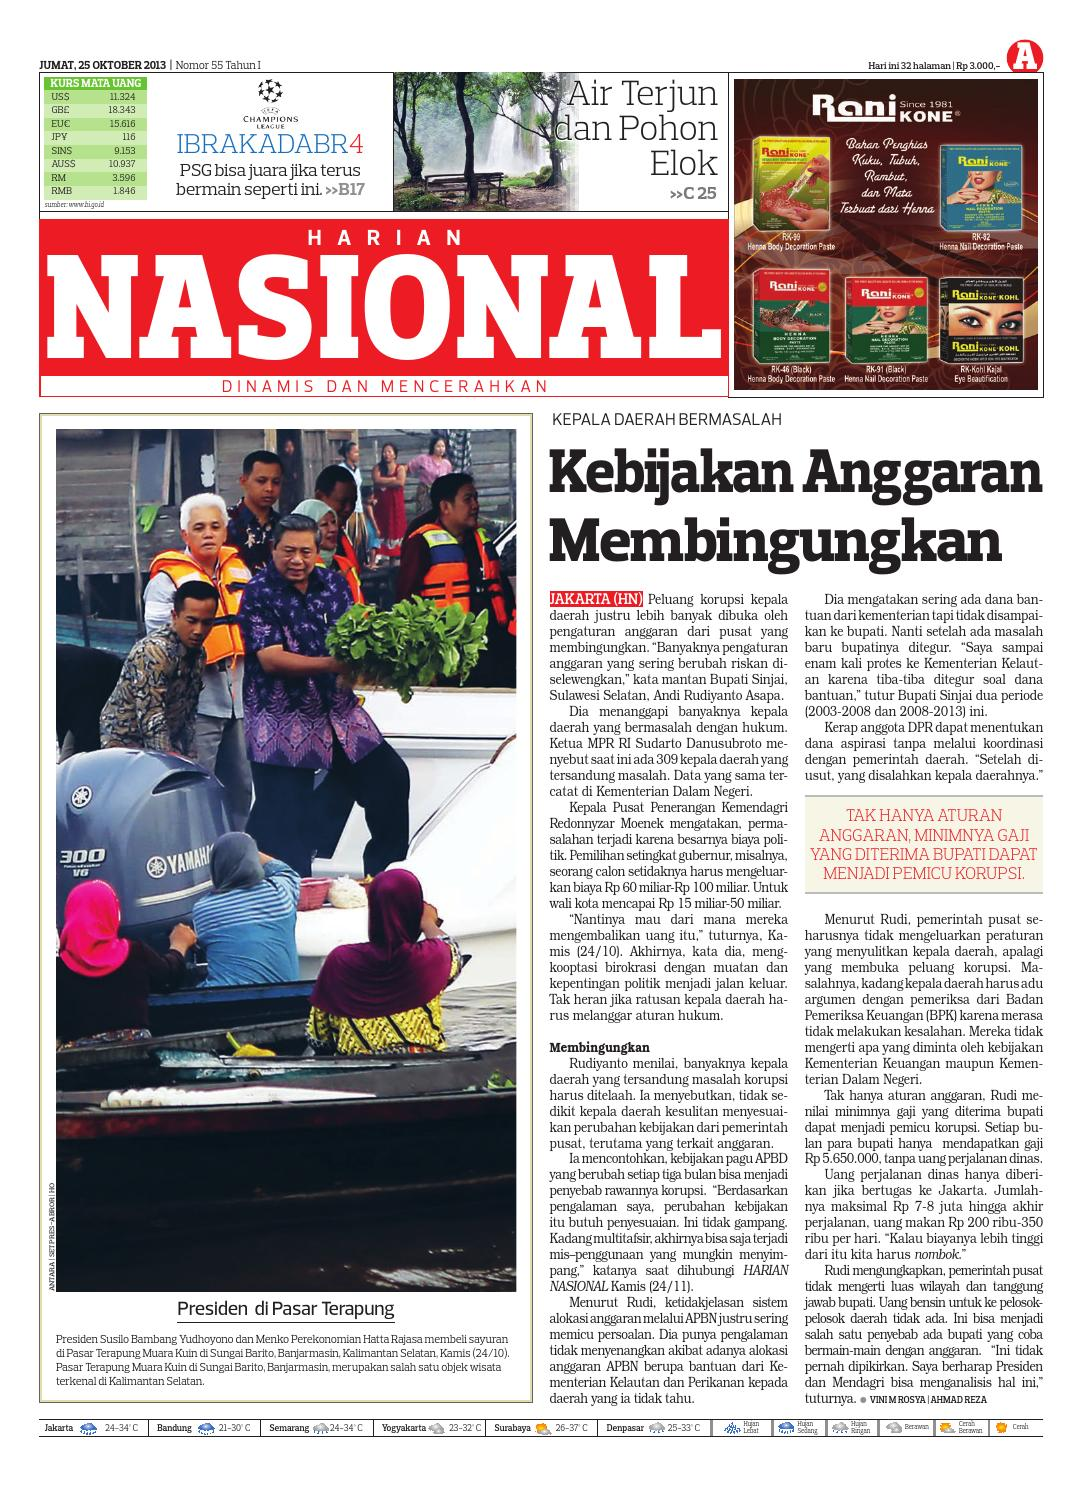 Harian Nasional By Issuu Produk Ukm Bumn Sepatu Batik Chanting Katun